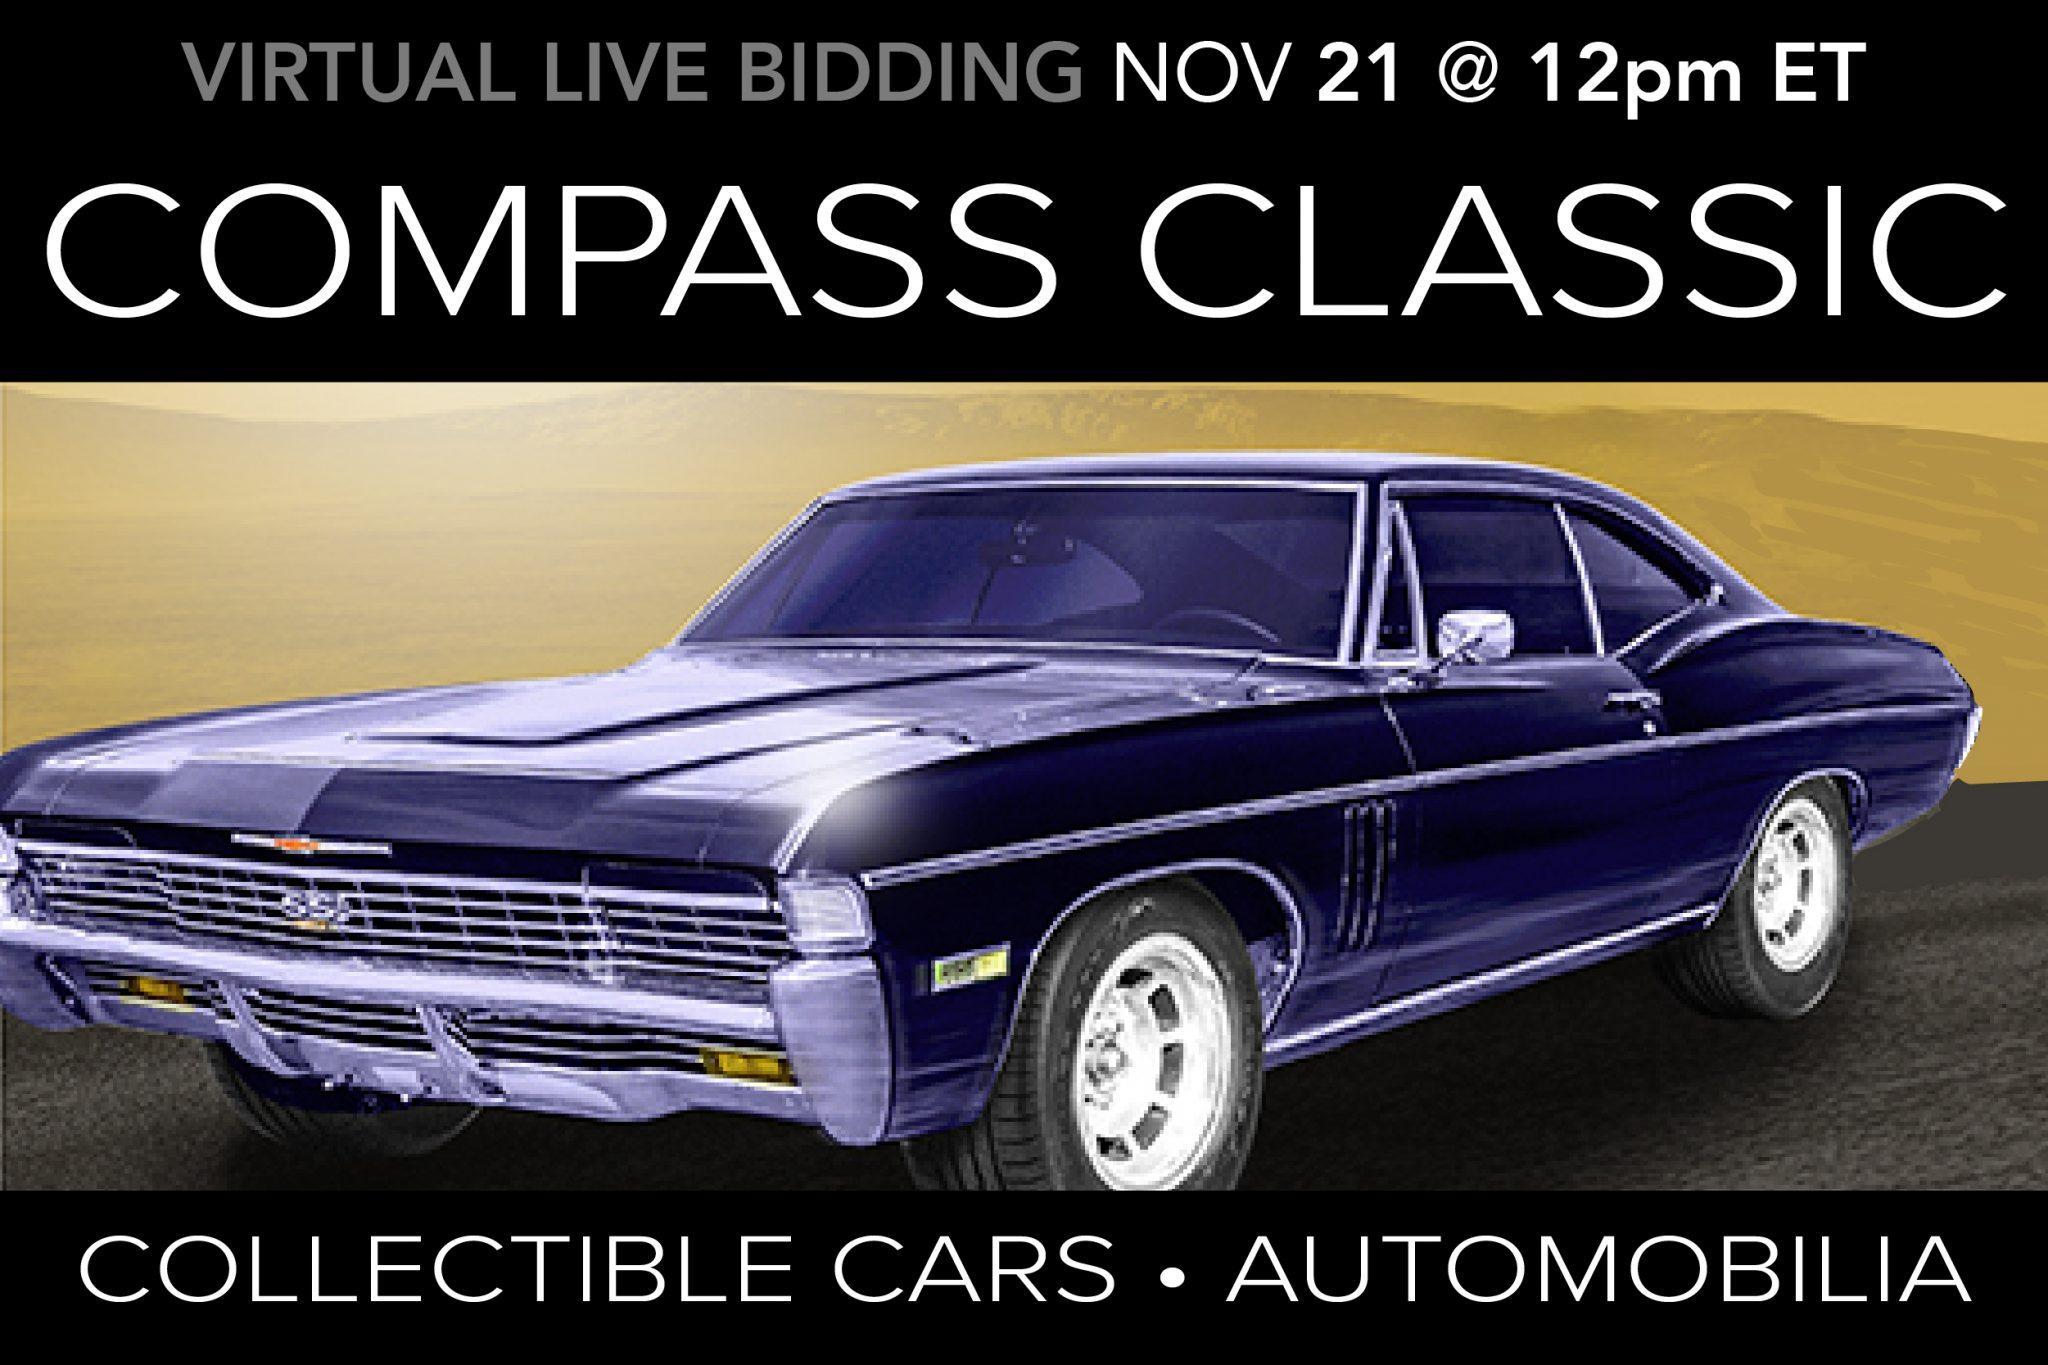 November 2020 Compass Classic Automobilia Memorabilia Cars Motorcyles